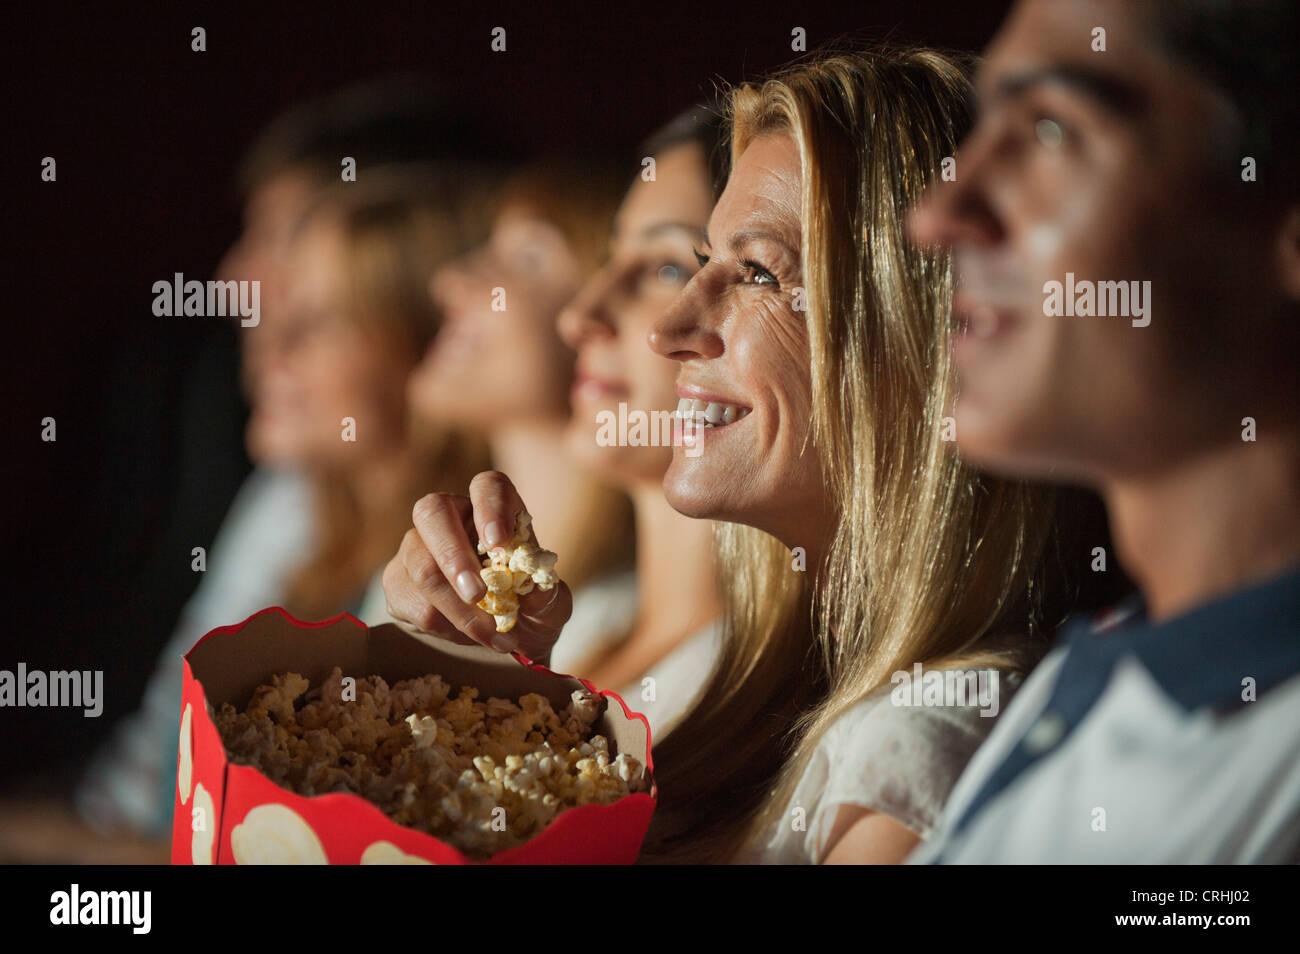 Frau Essen Popcorn bei Film im theater Stockbild